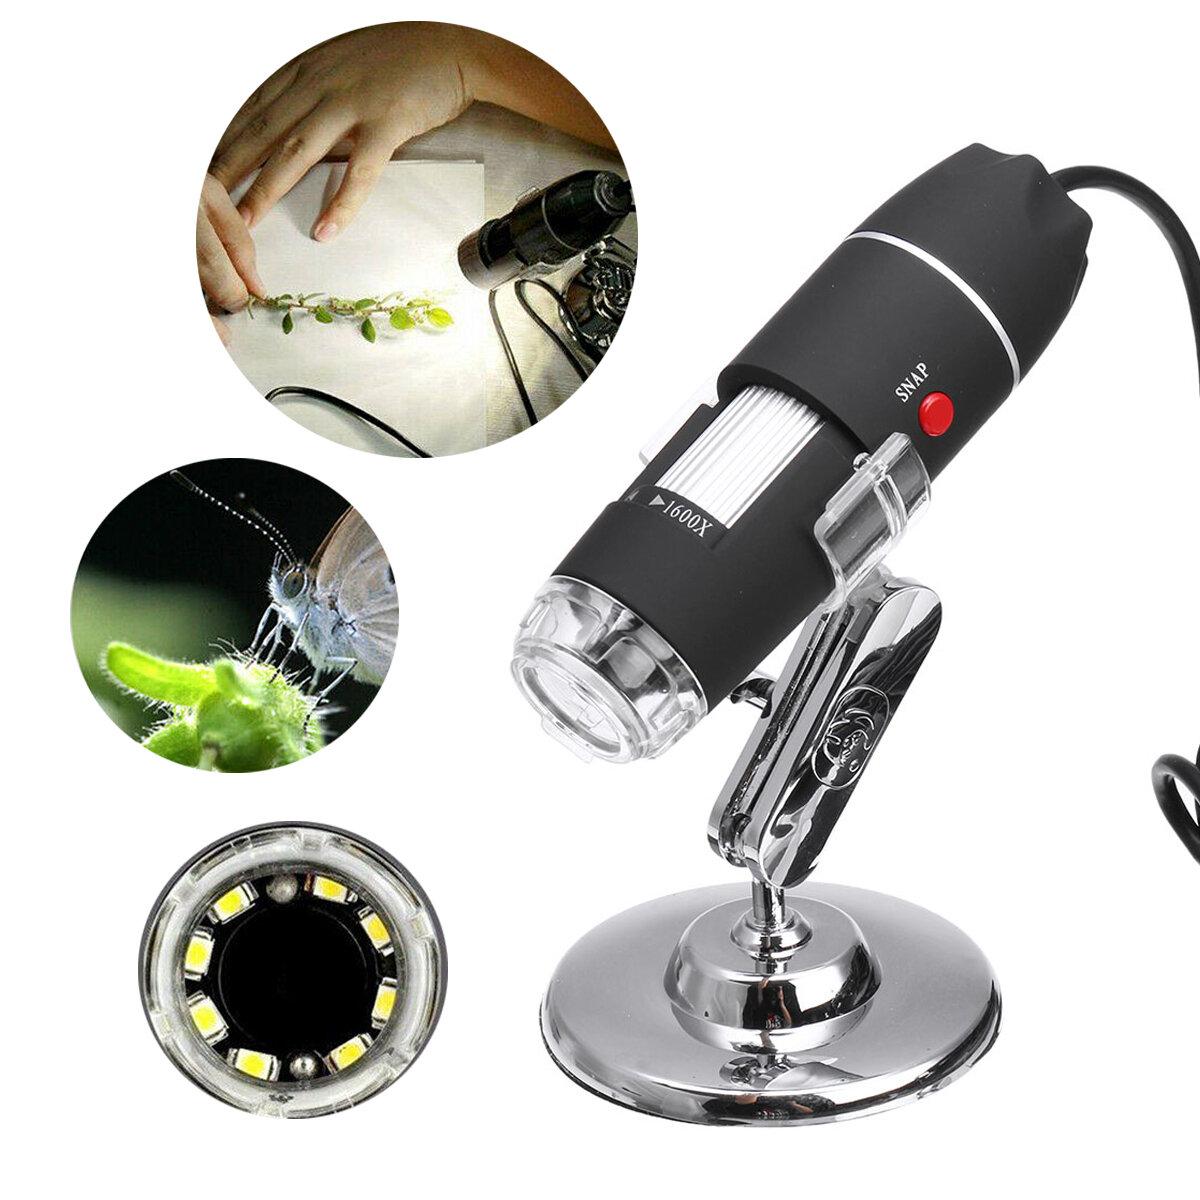 1600X 8 LED USB Zoom 3 In1 Digital Microscope Handheld Biological USB Microscope Magnification